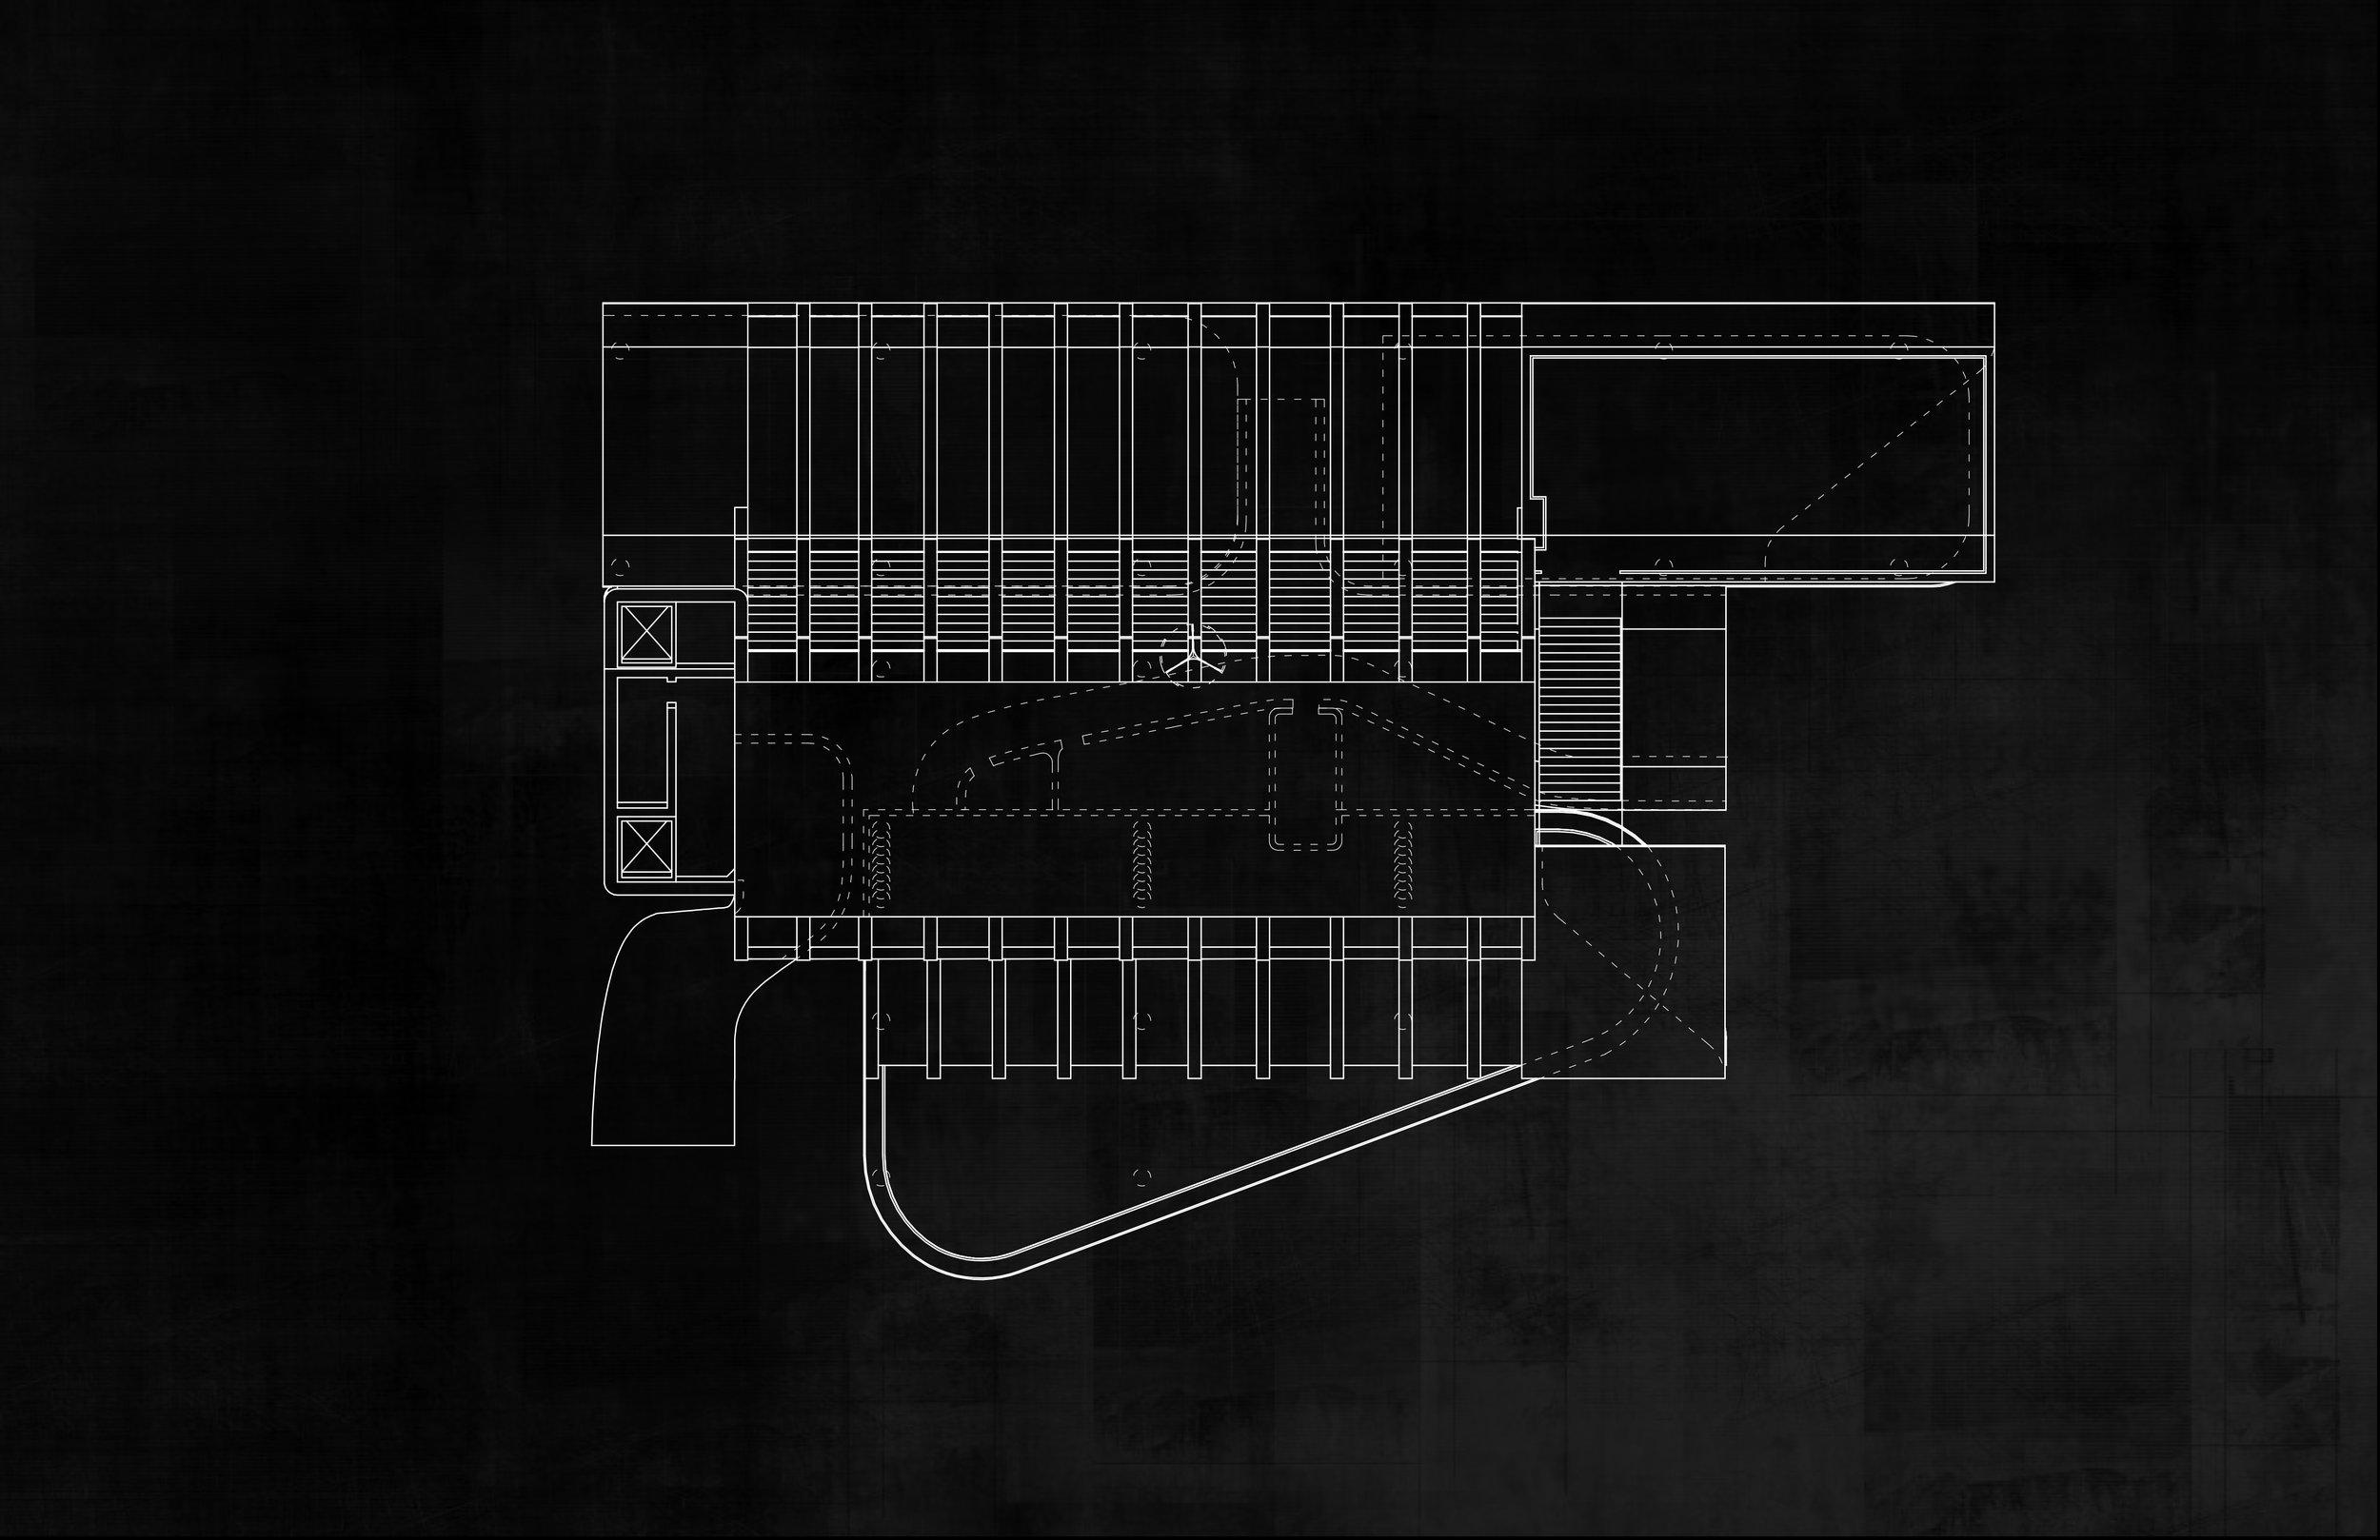 roof plan - 0.jpg